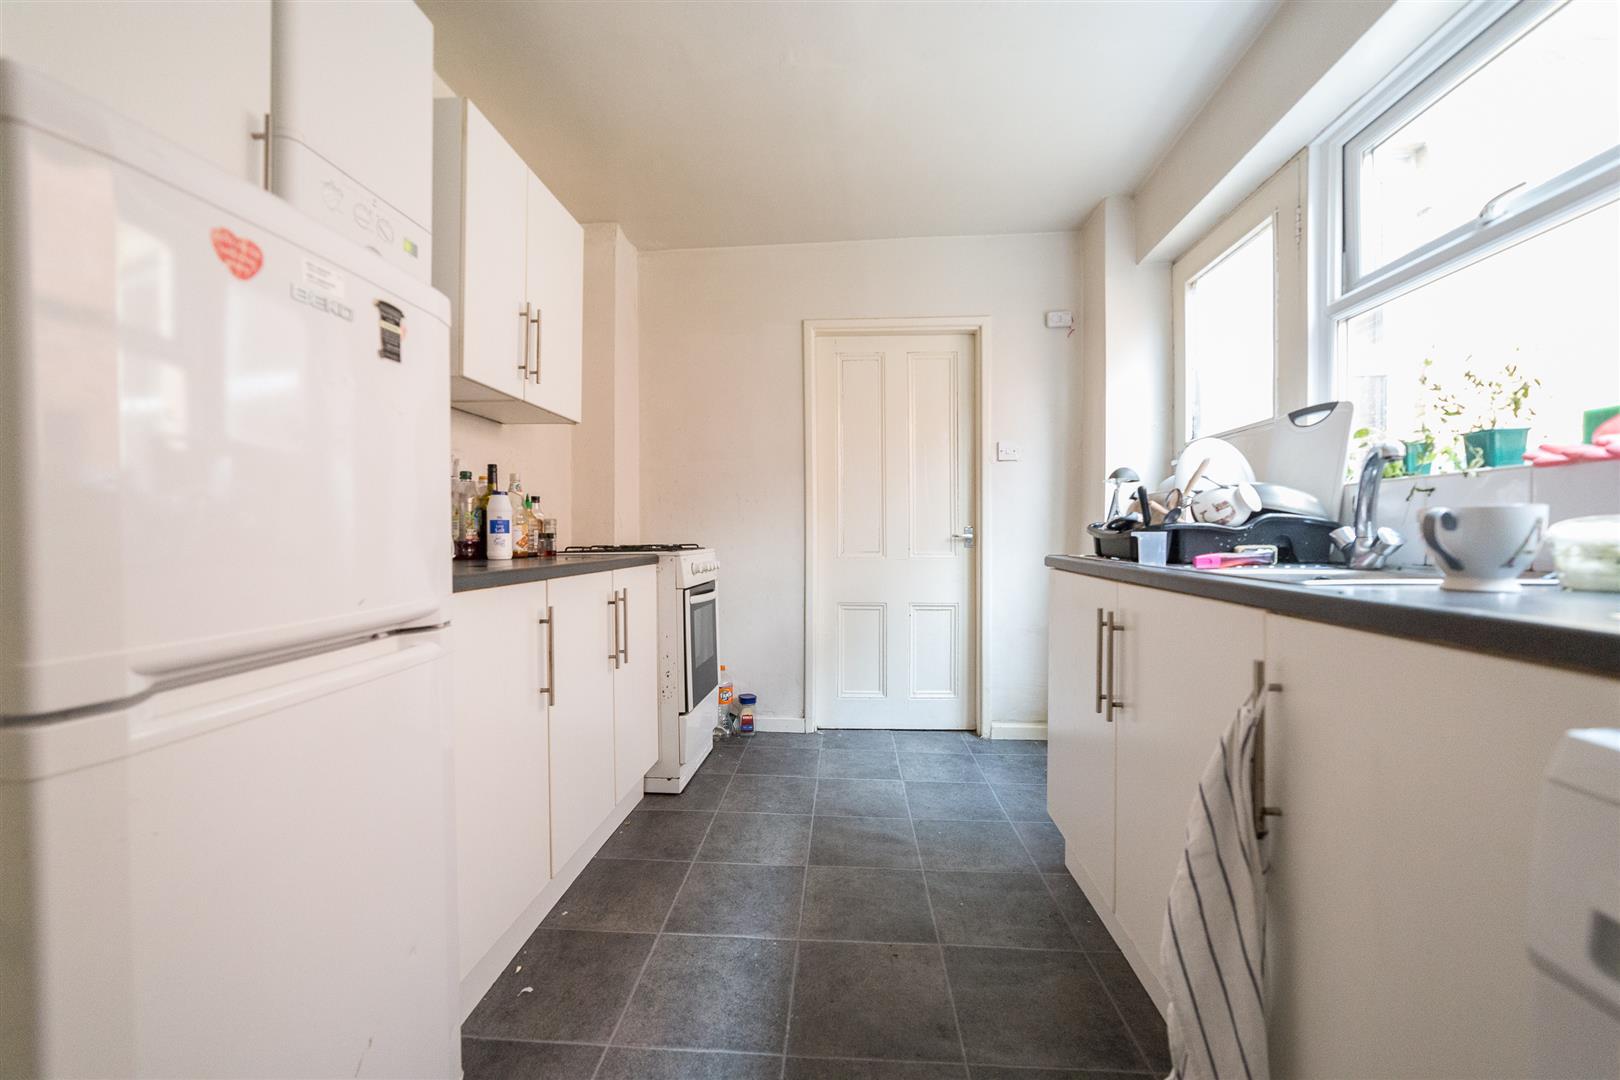 2 bed flat to rent in Newcastle Upon Tyne, NE6 5AR, NE6